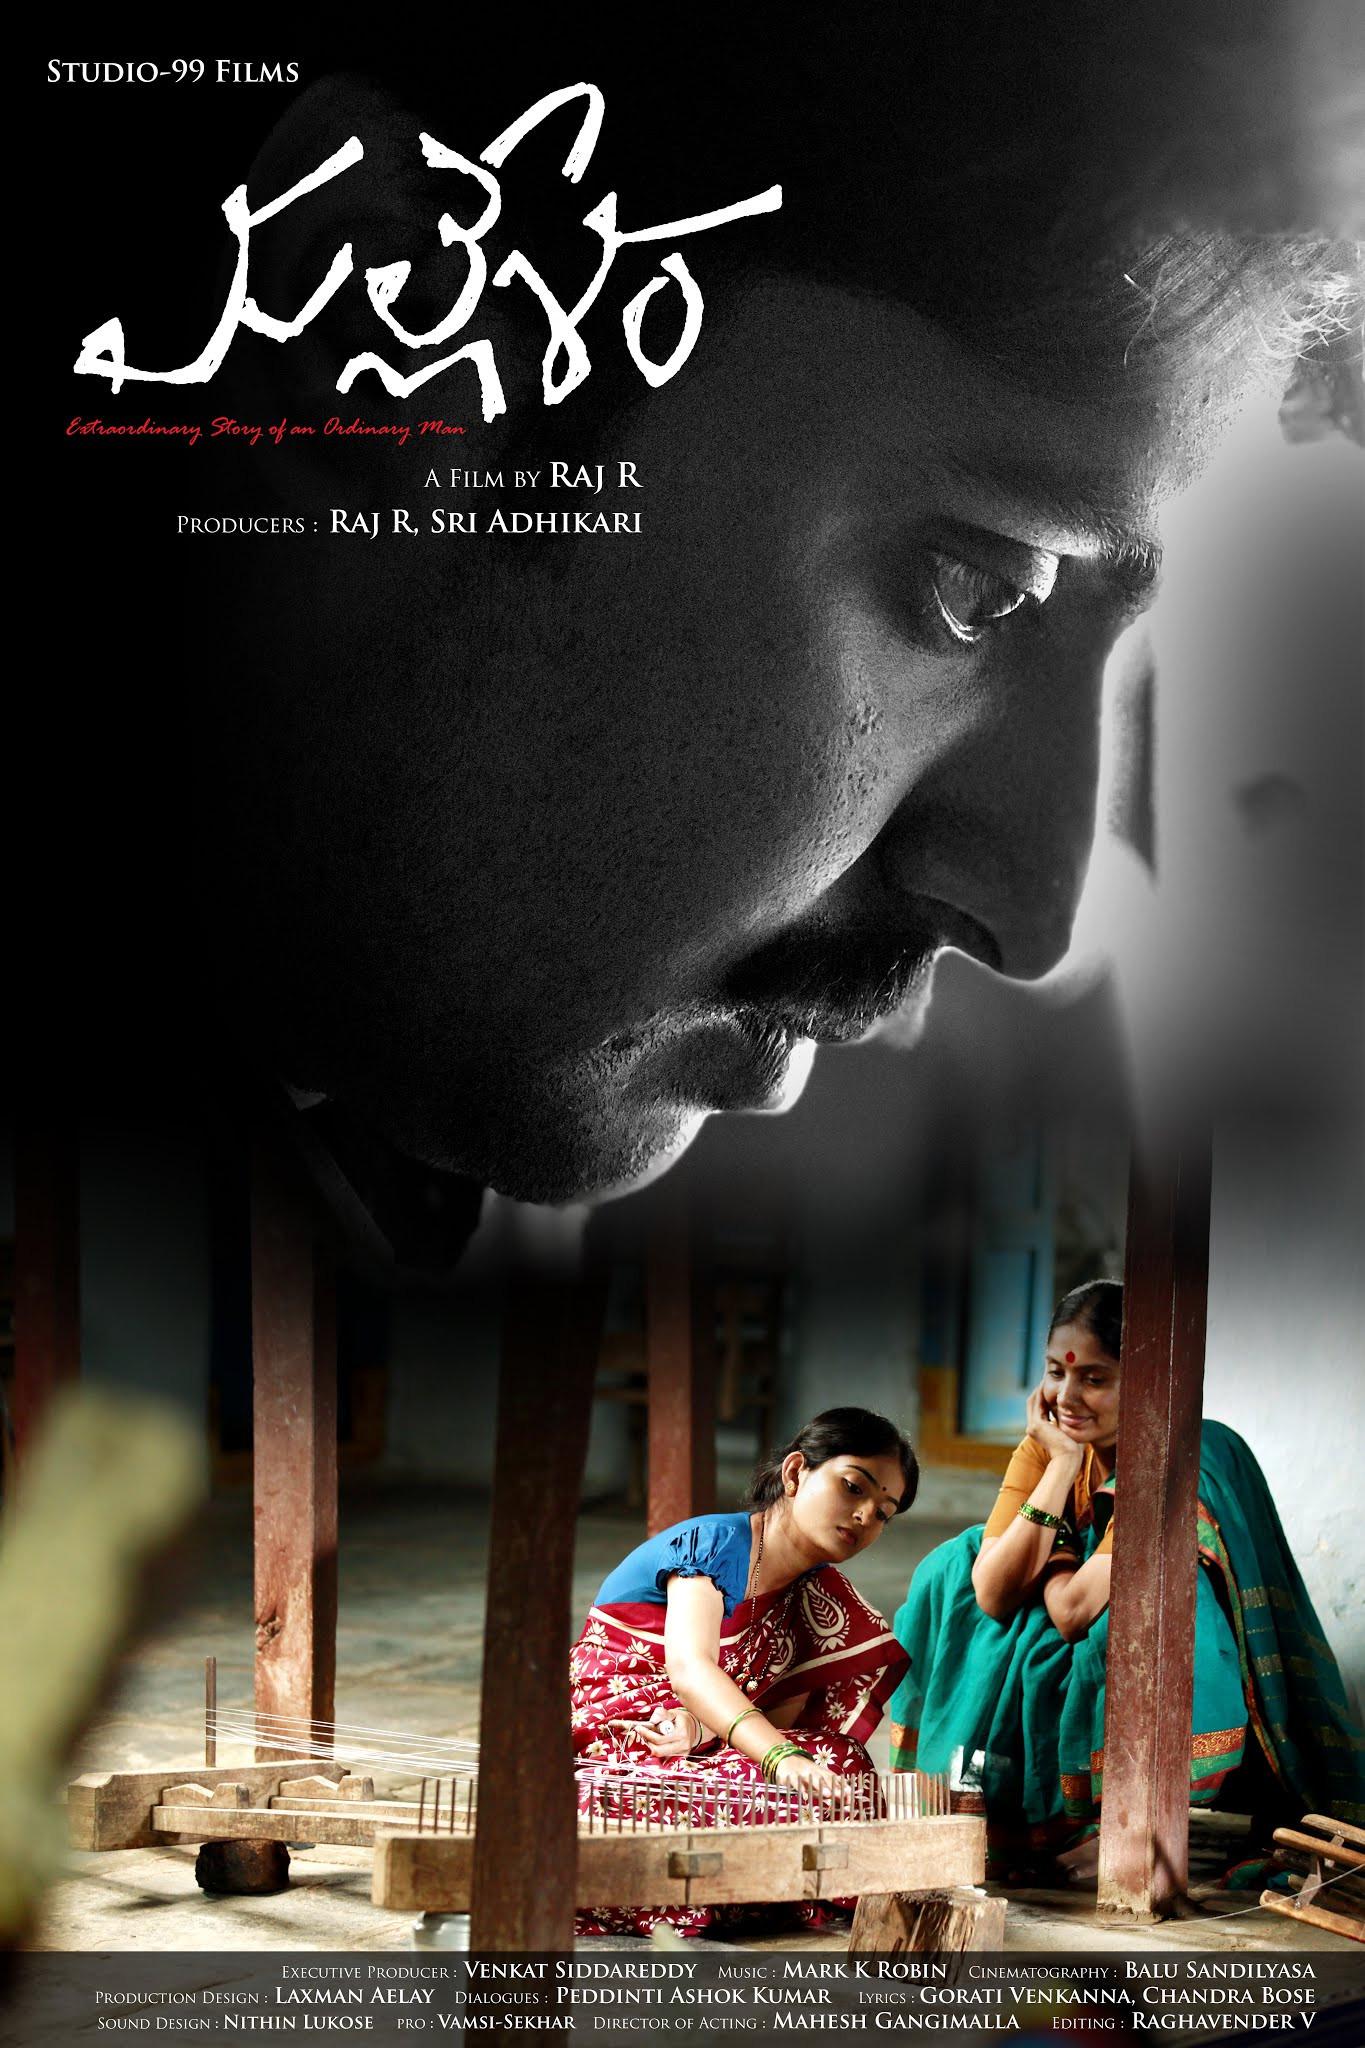 Padma Shri winner Chintakindi Mallesham Biopic First Look Poster HD